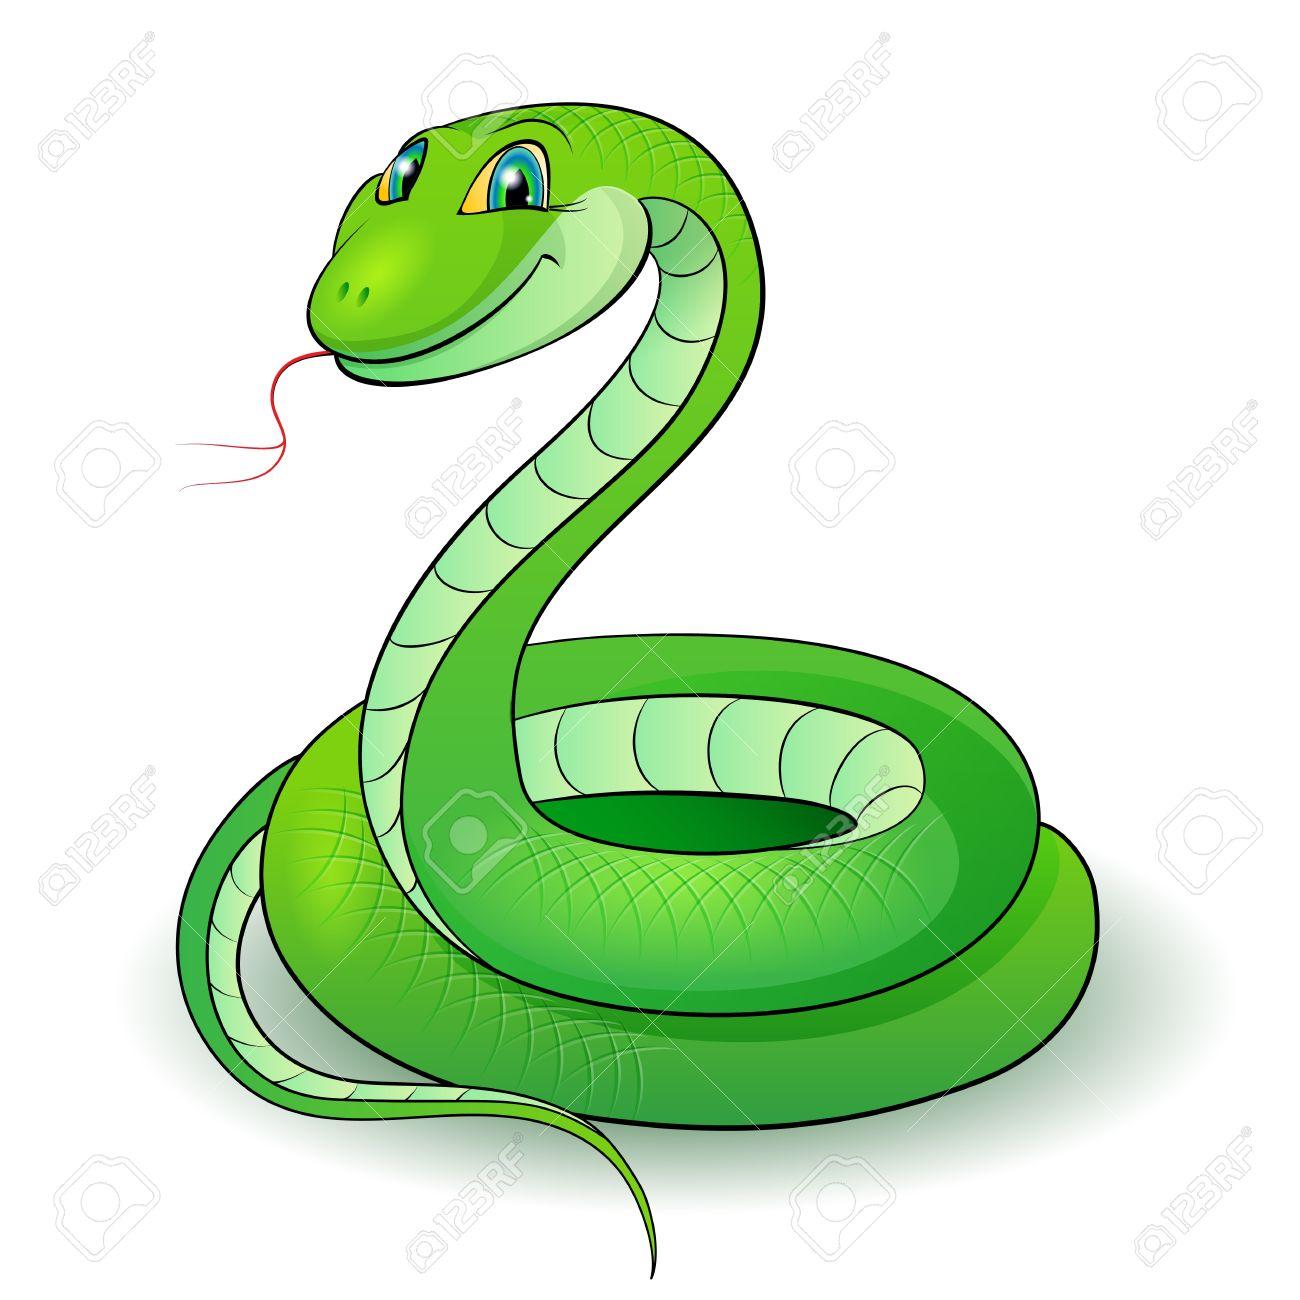 Cartoon Illustration of a nice green snake. Stock Vector - 16976779